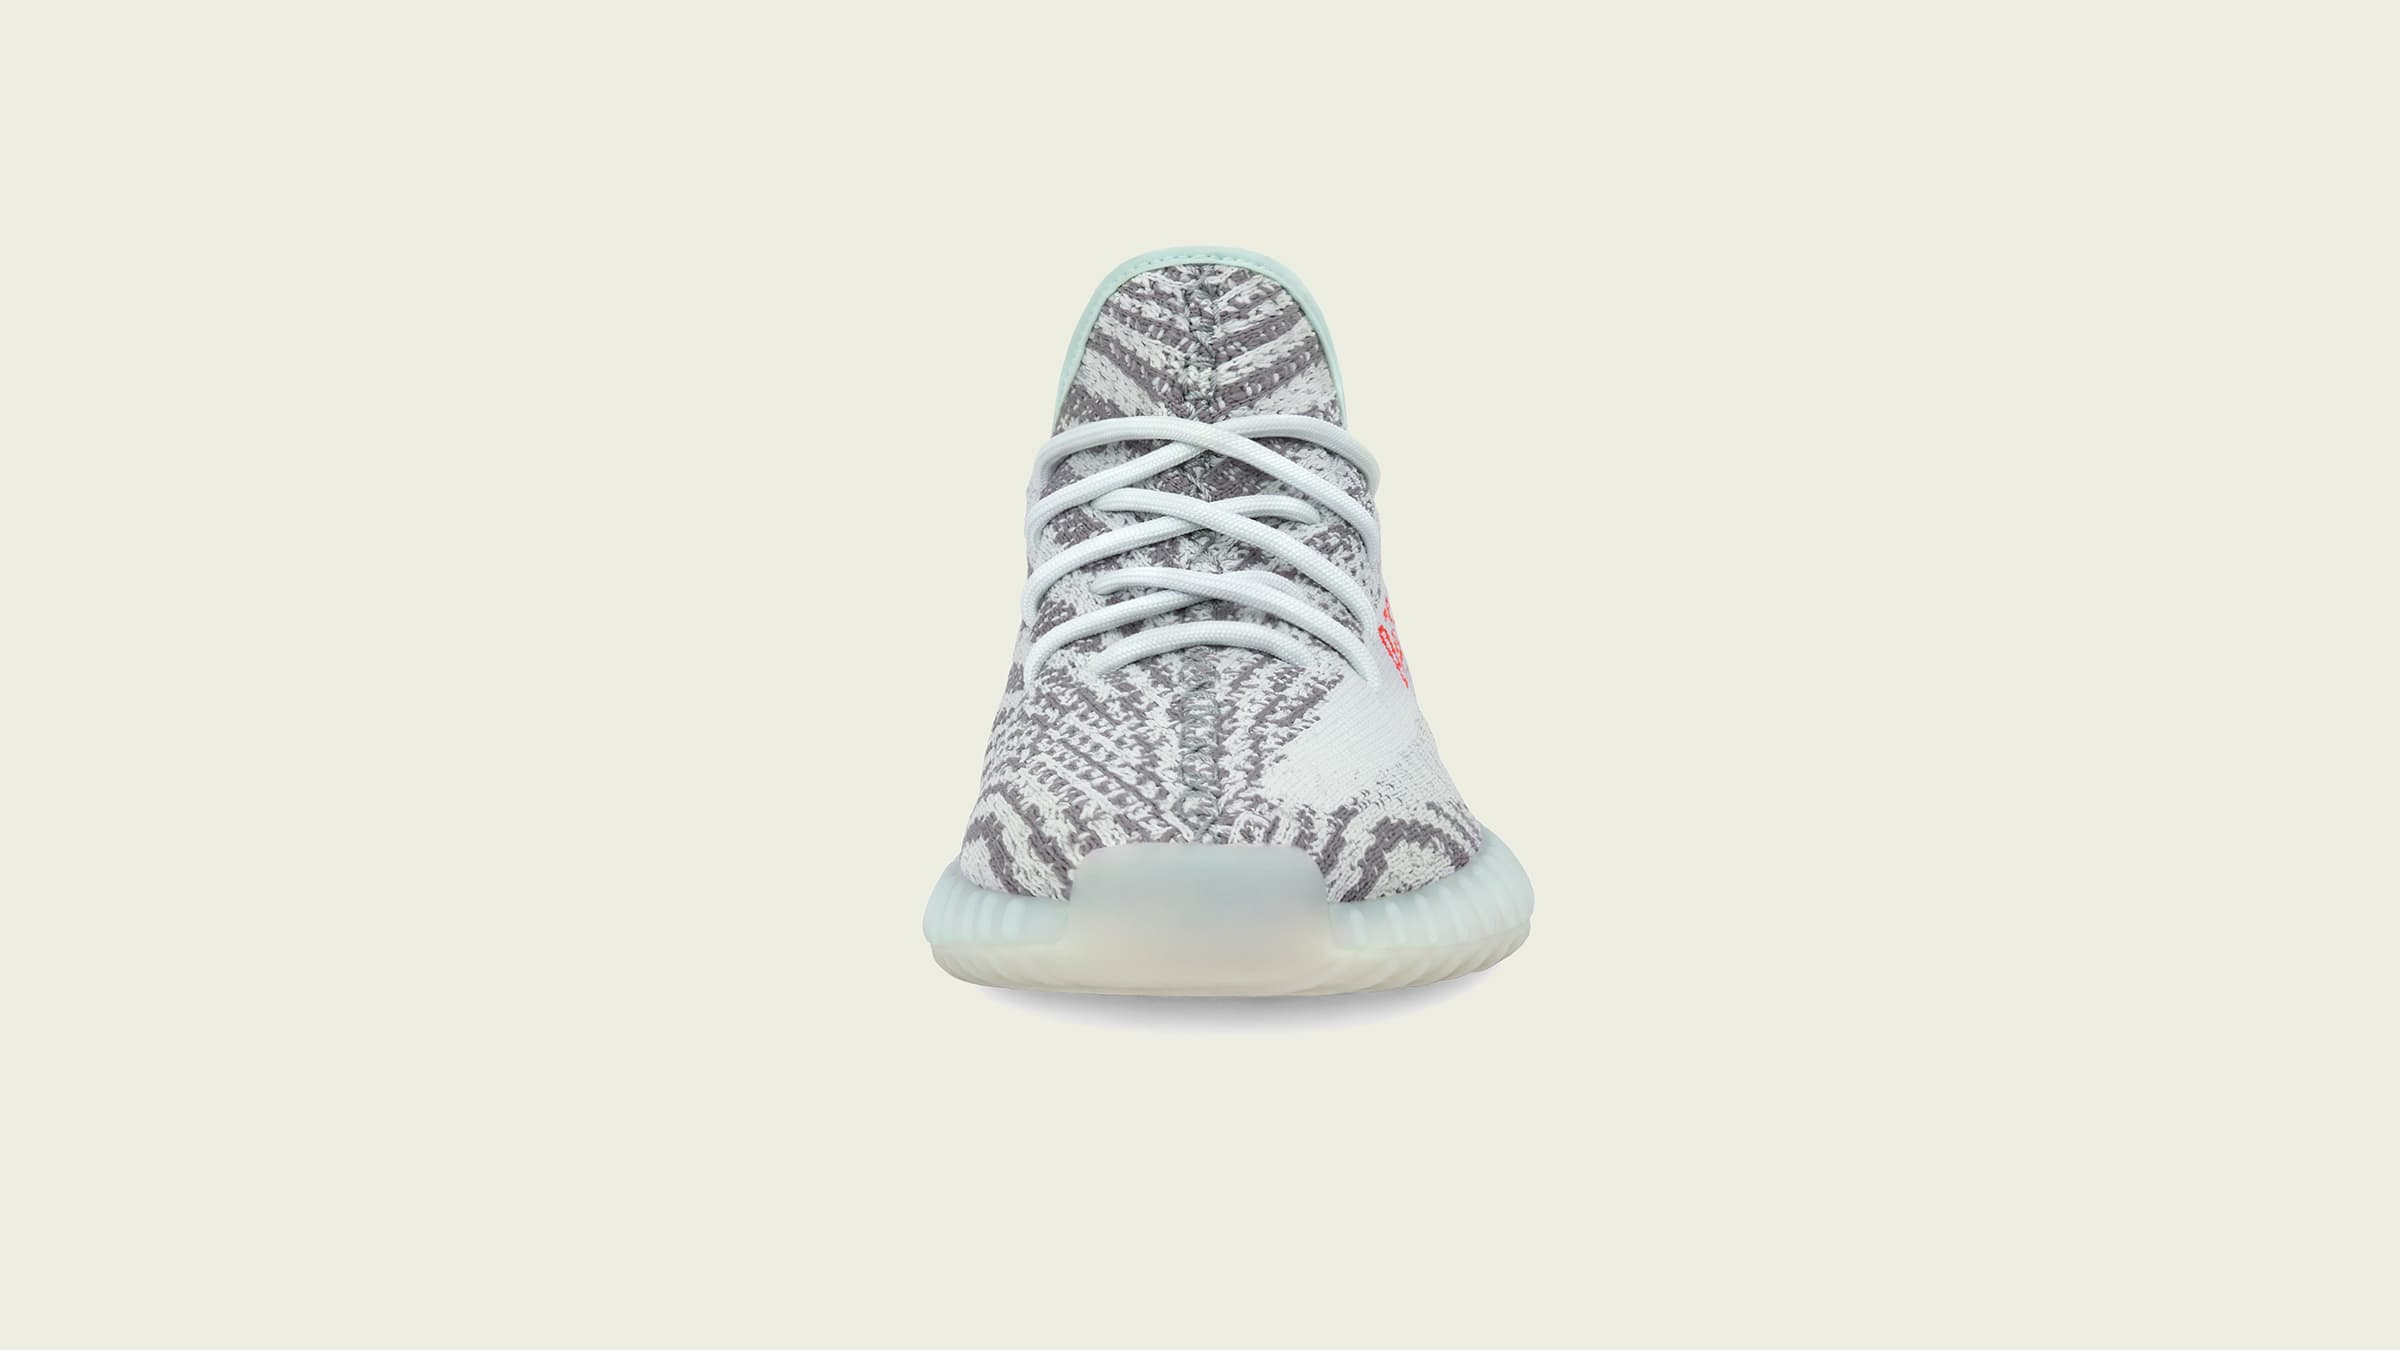 357fd5c6c4a Adidas Yeezy Boost 350 V2 (Blue Tint